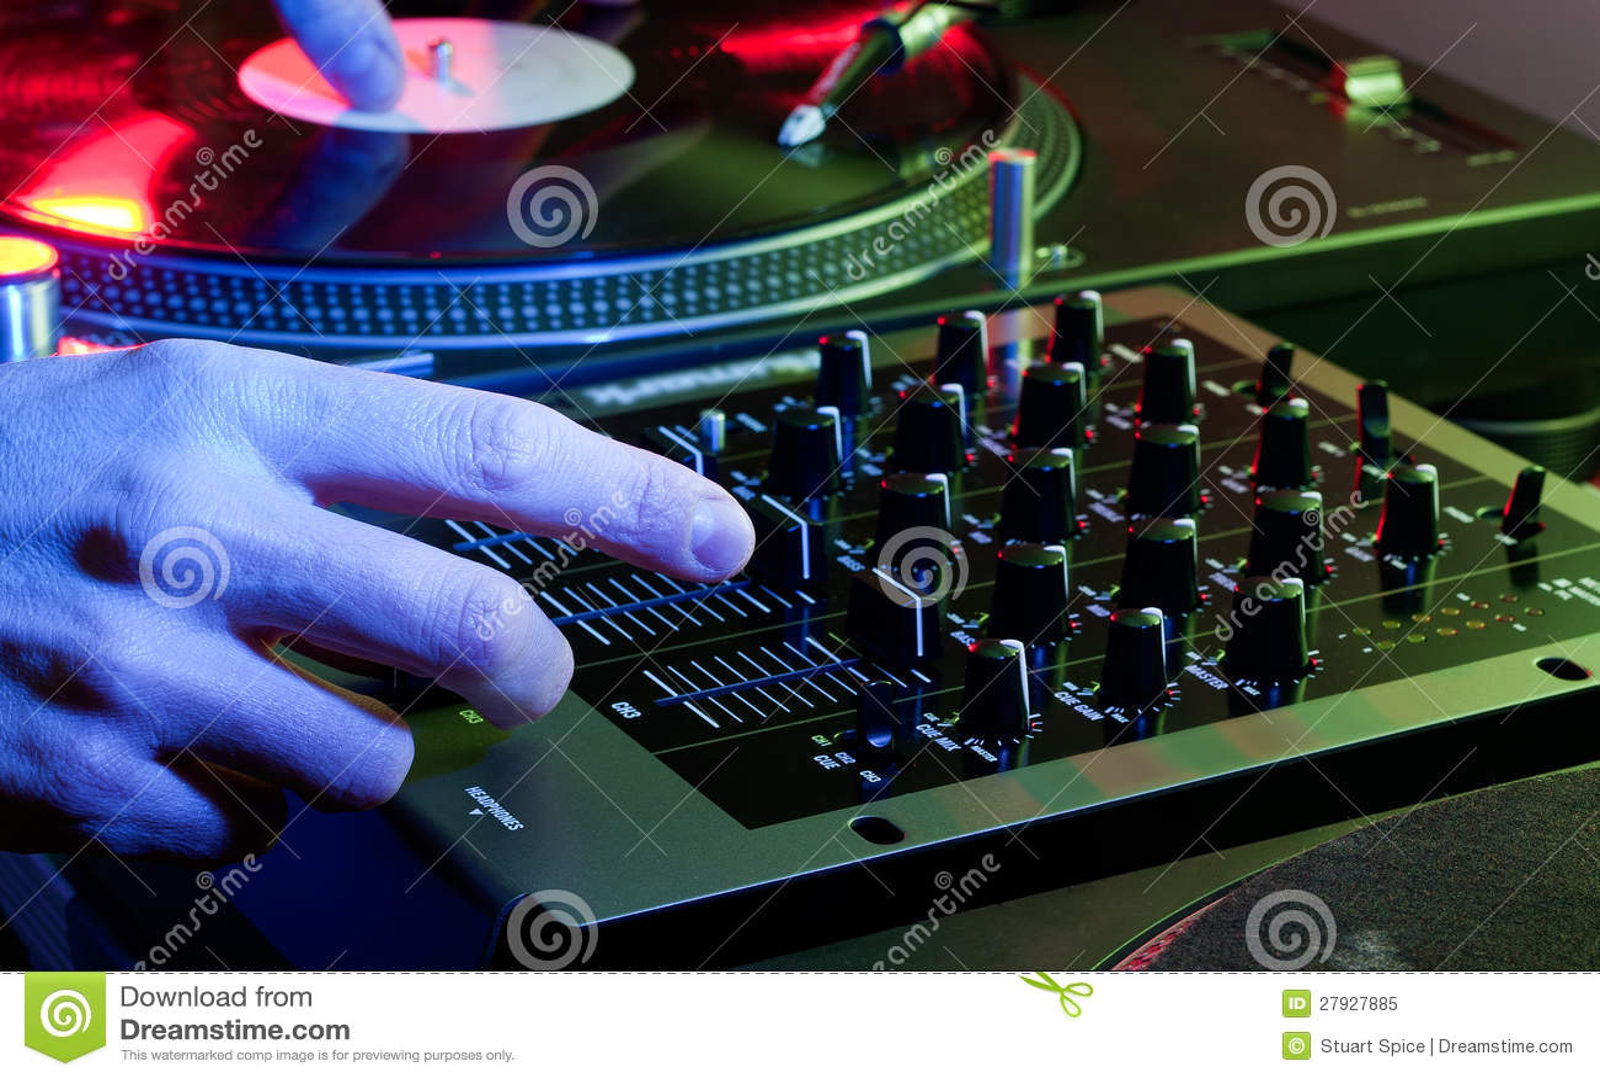 Dj Using Both Hands On A Mixer Setup Stock Image Image Of Music